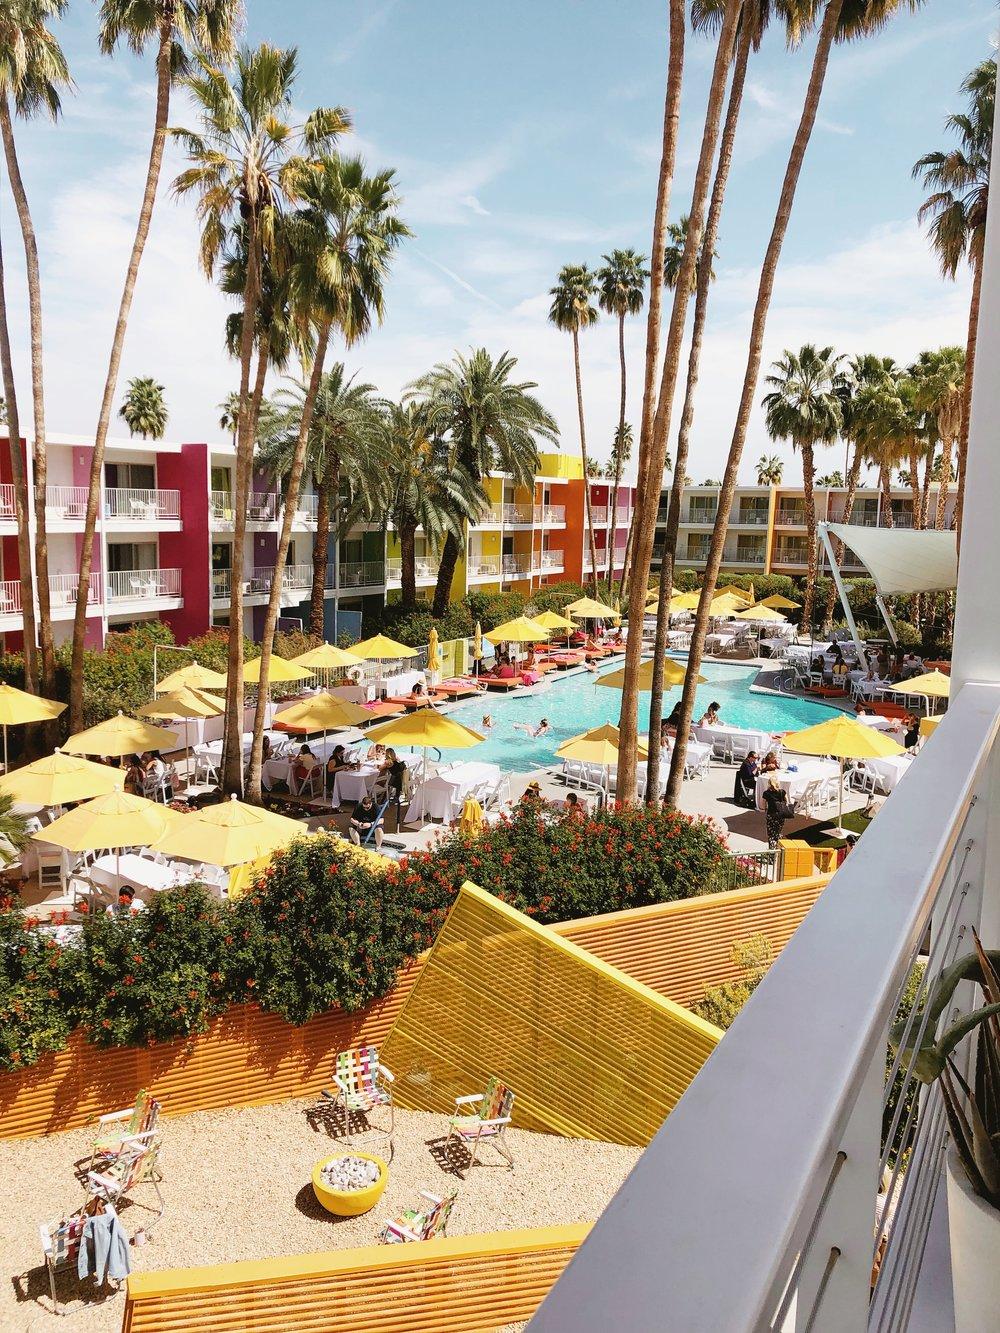 Saguaro Hotel Pool Area